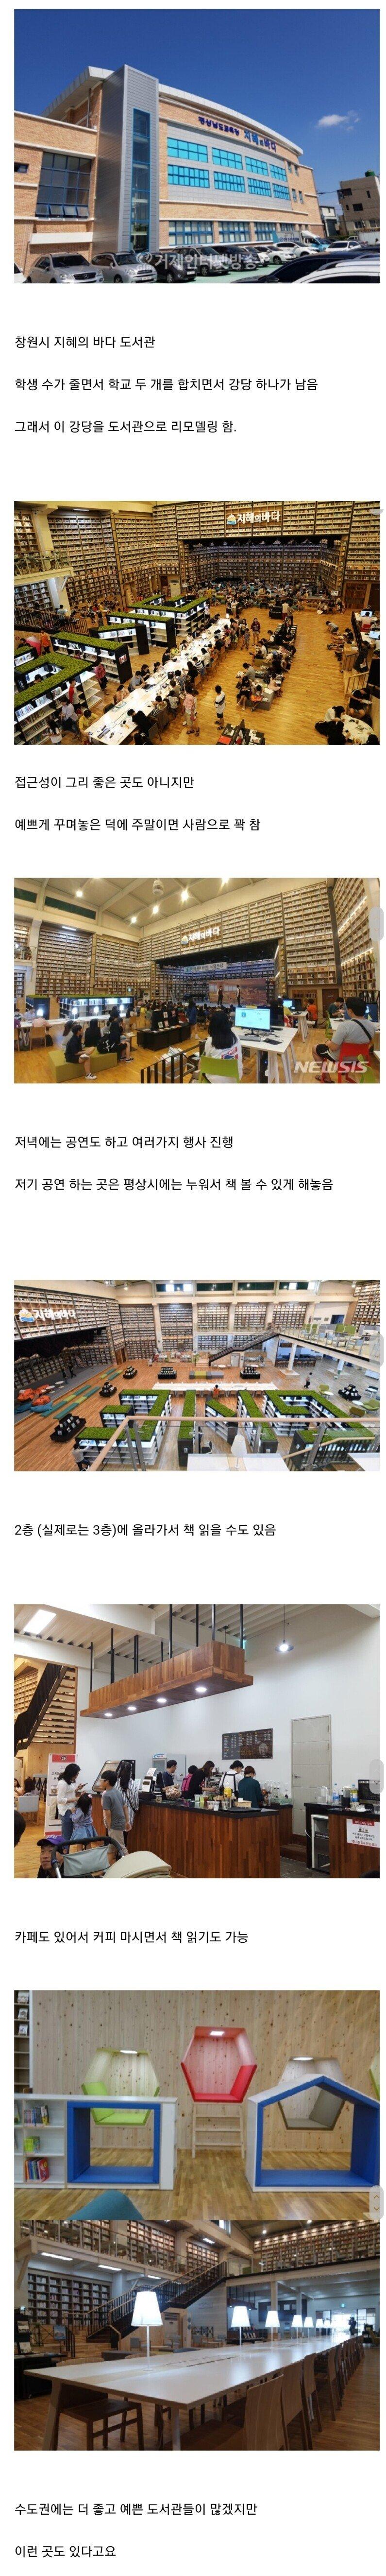 Screenshot_20191227-020658_Samsung Internet.jpg 필요 없어진 학교 강당 리모델링 모범 사례.jpg